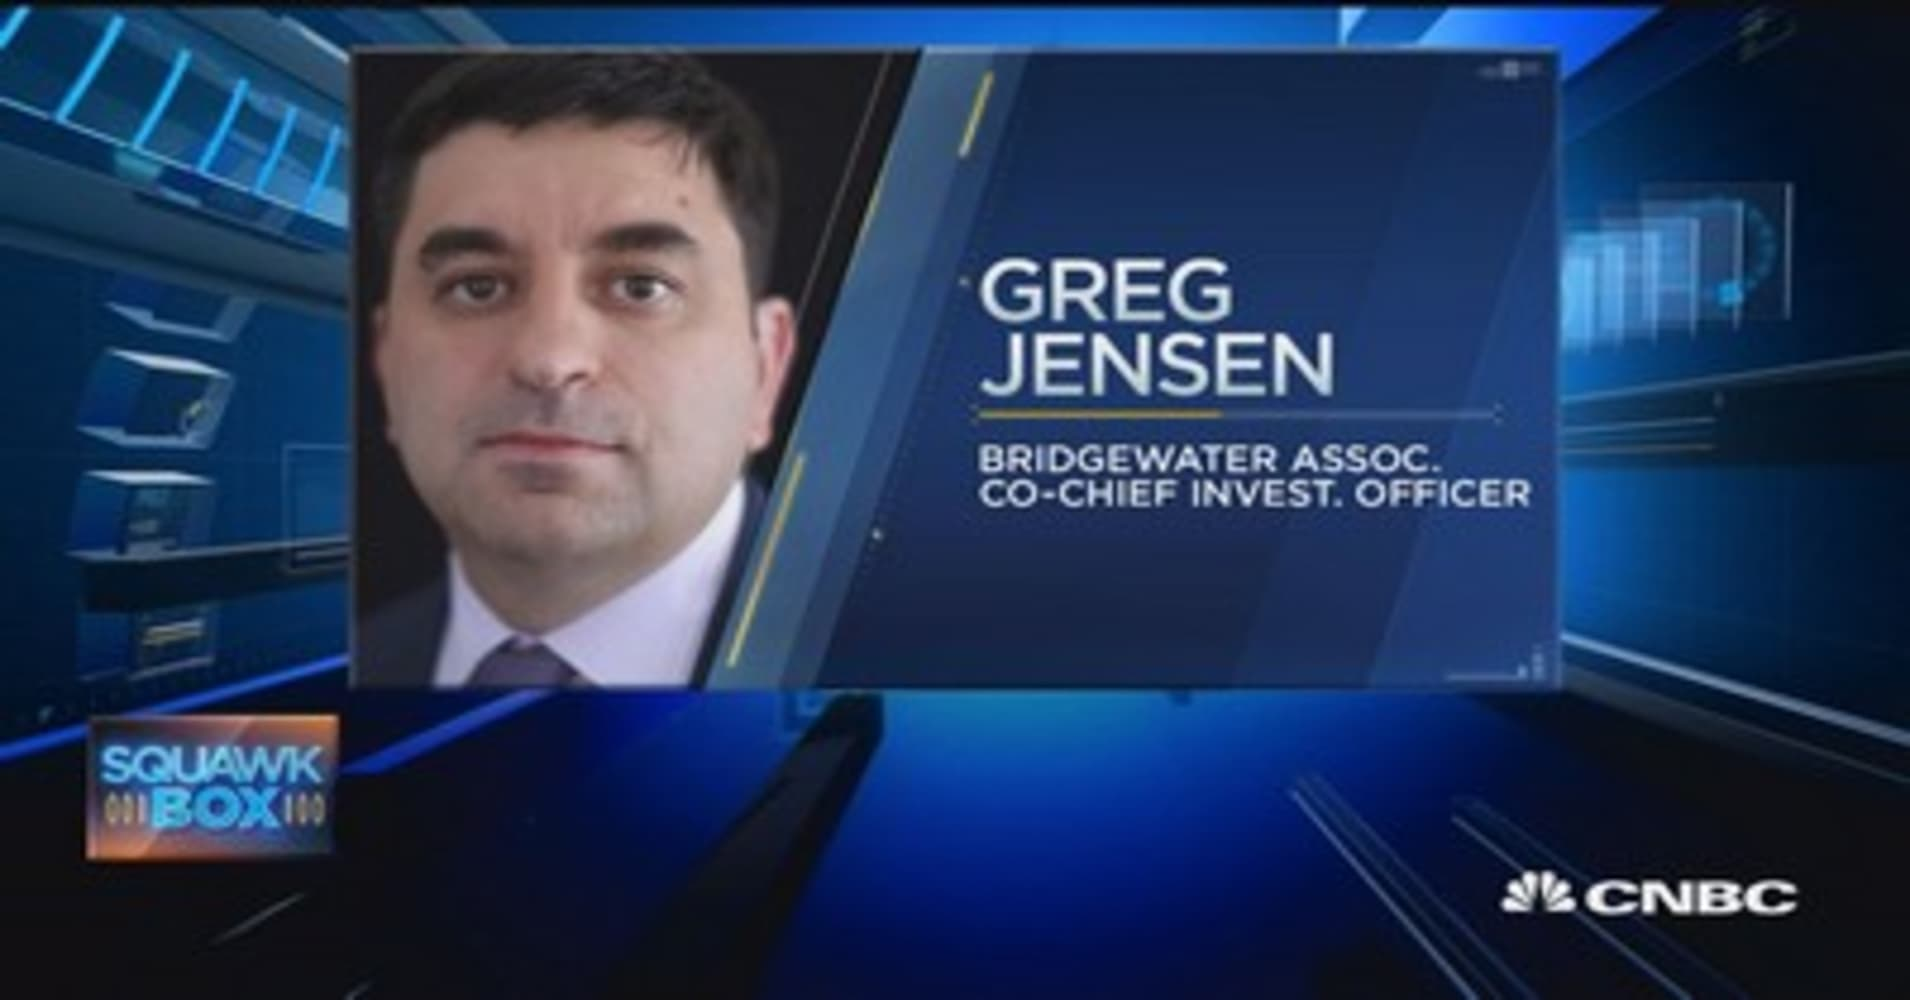 Shifting leadership roles at Bridgewater